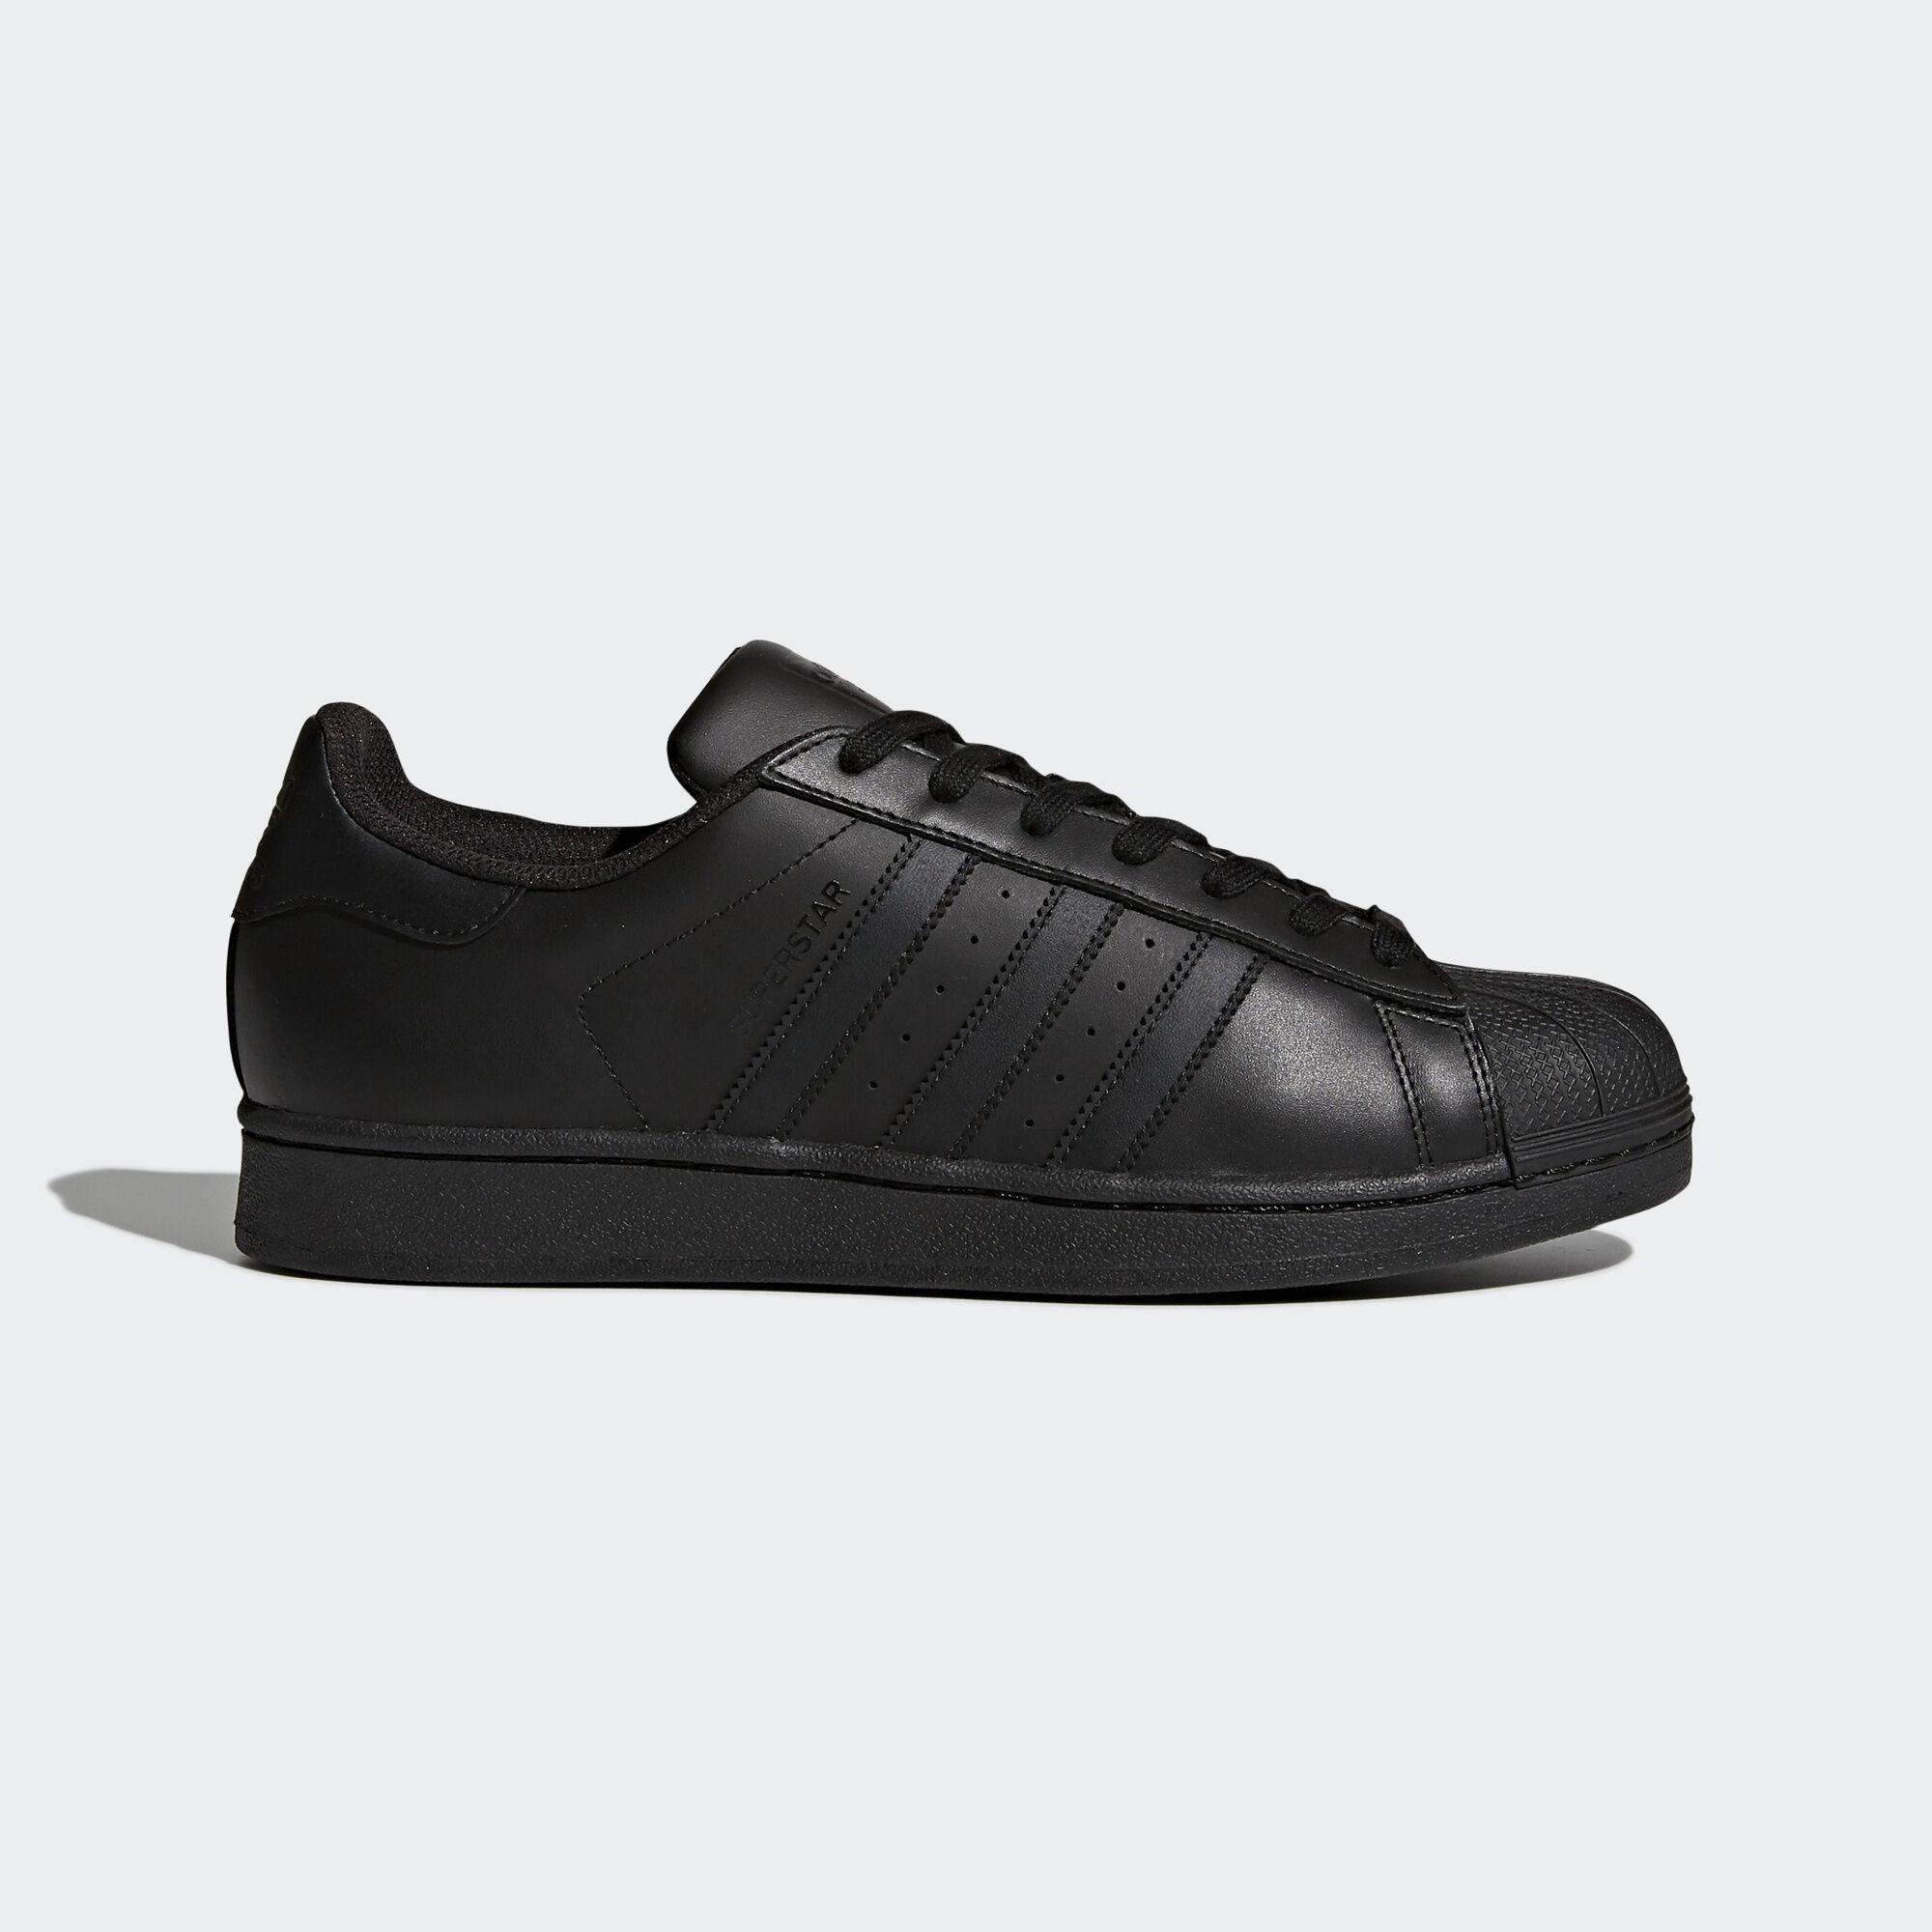 Classic Brand Adidas Zx Flux Core Shoes Camo Mens Metallic Black Grey